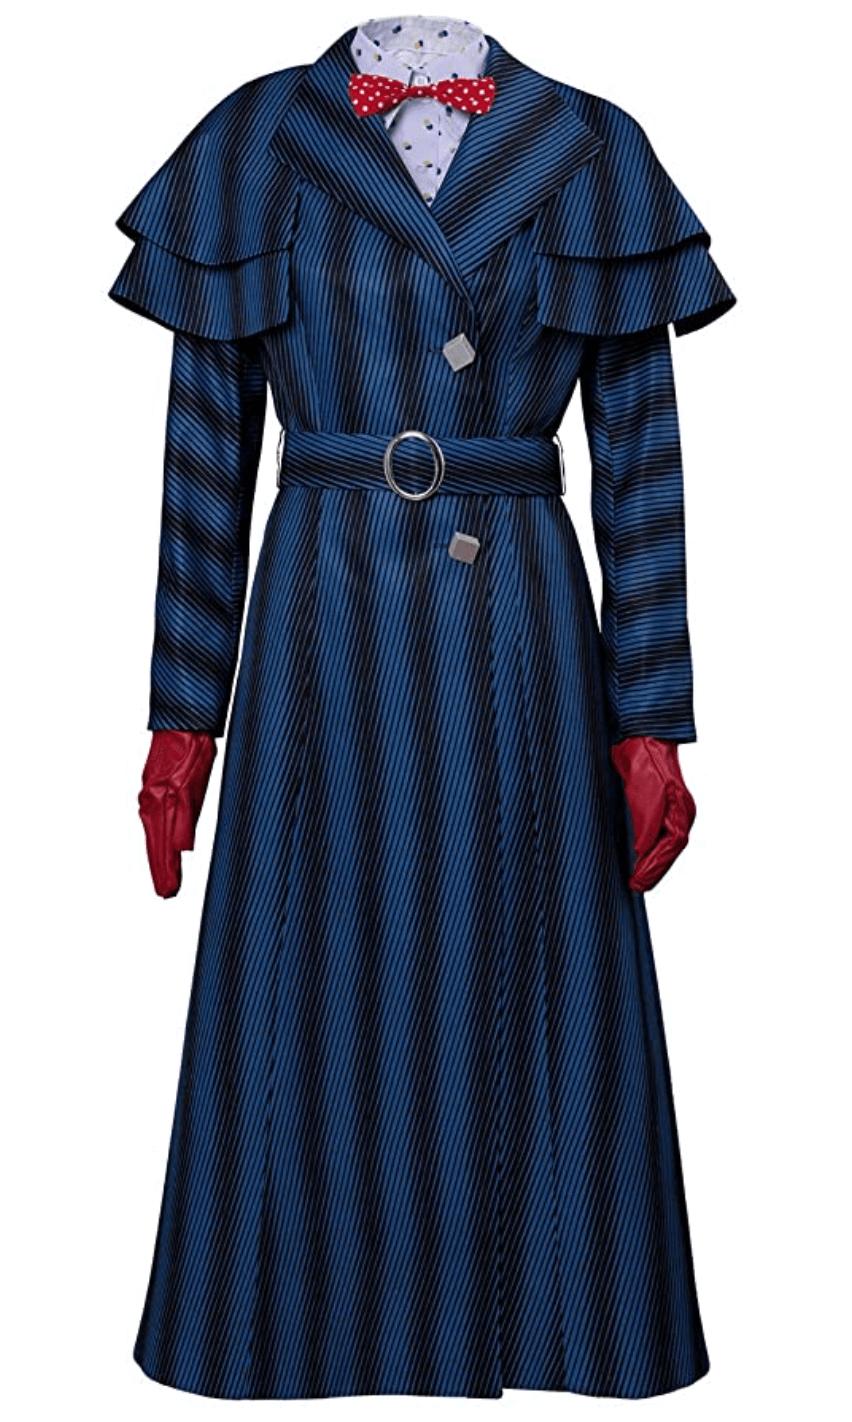 mary poppins cosplay